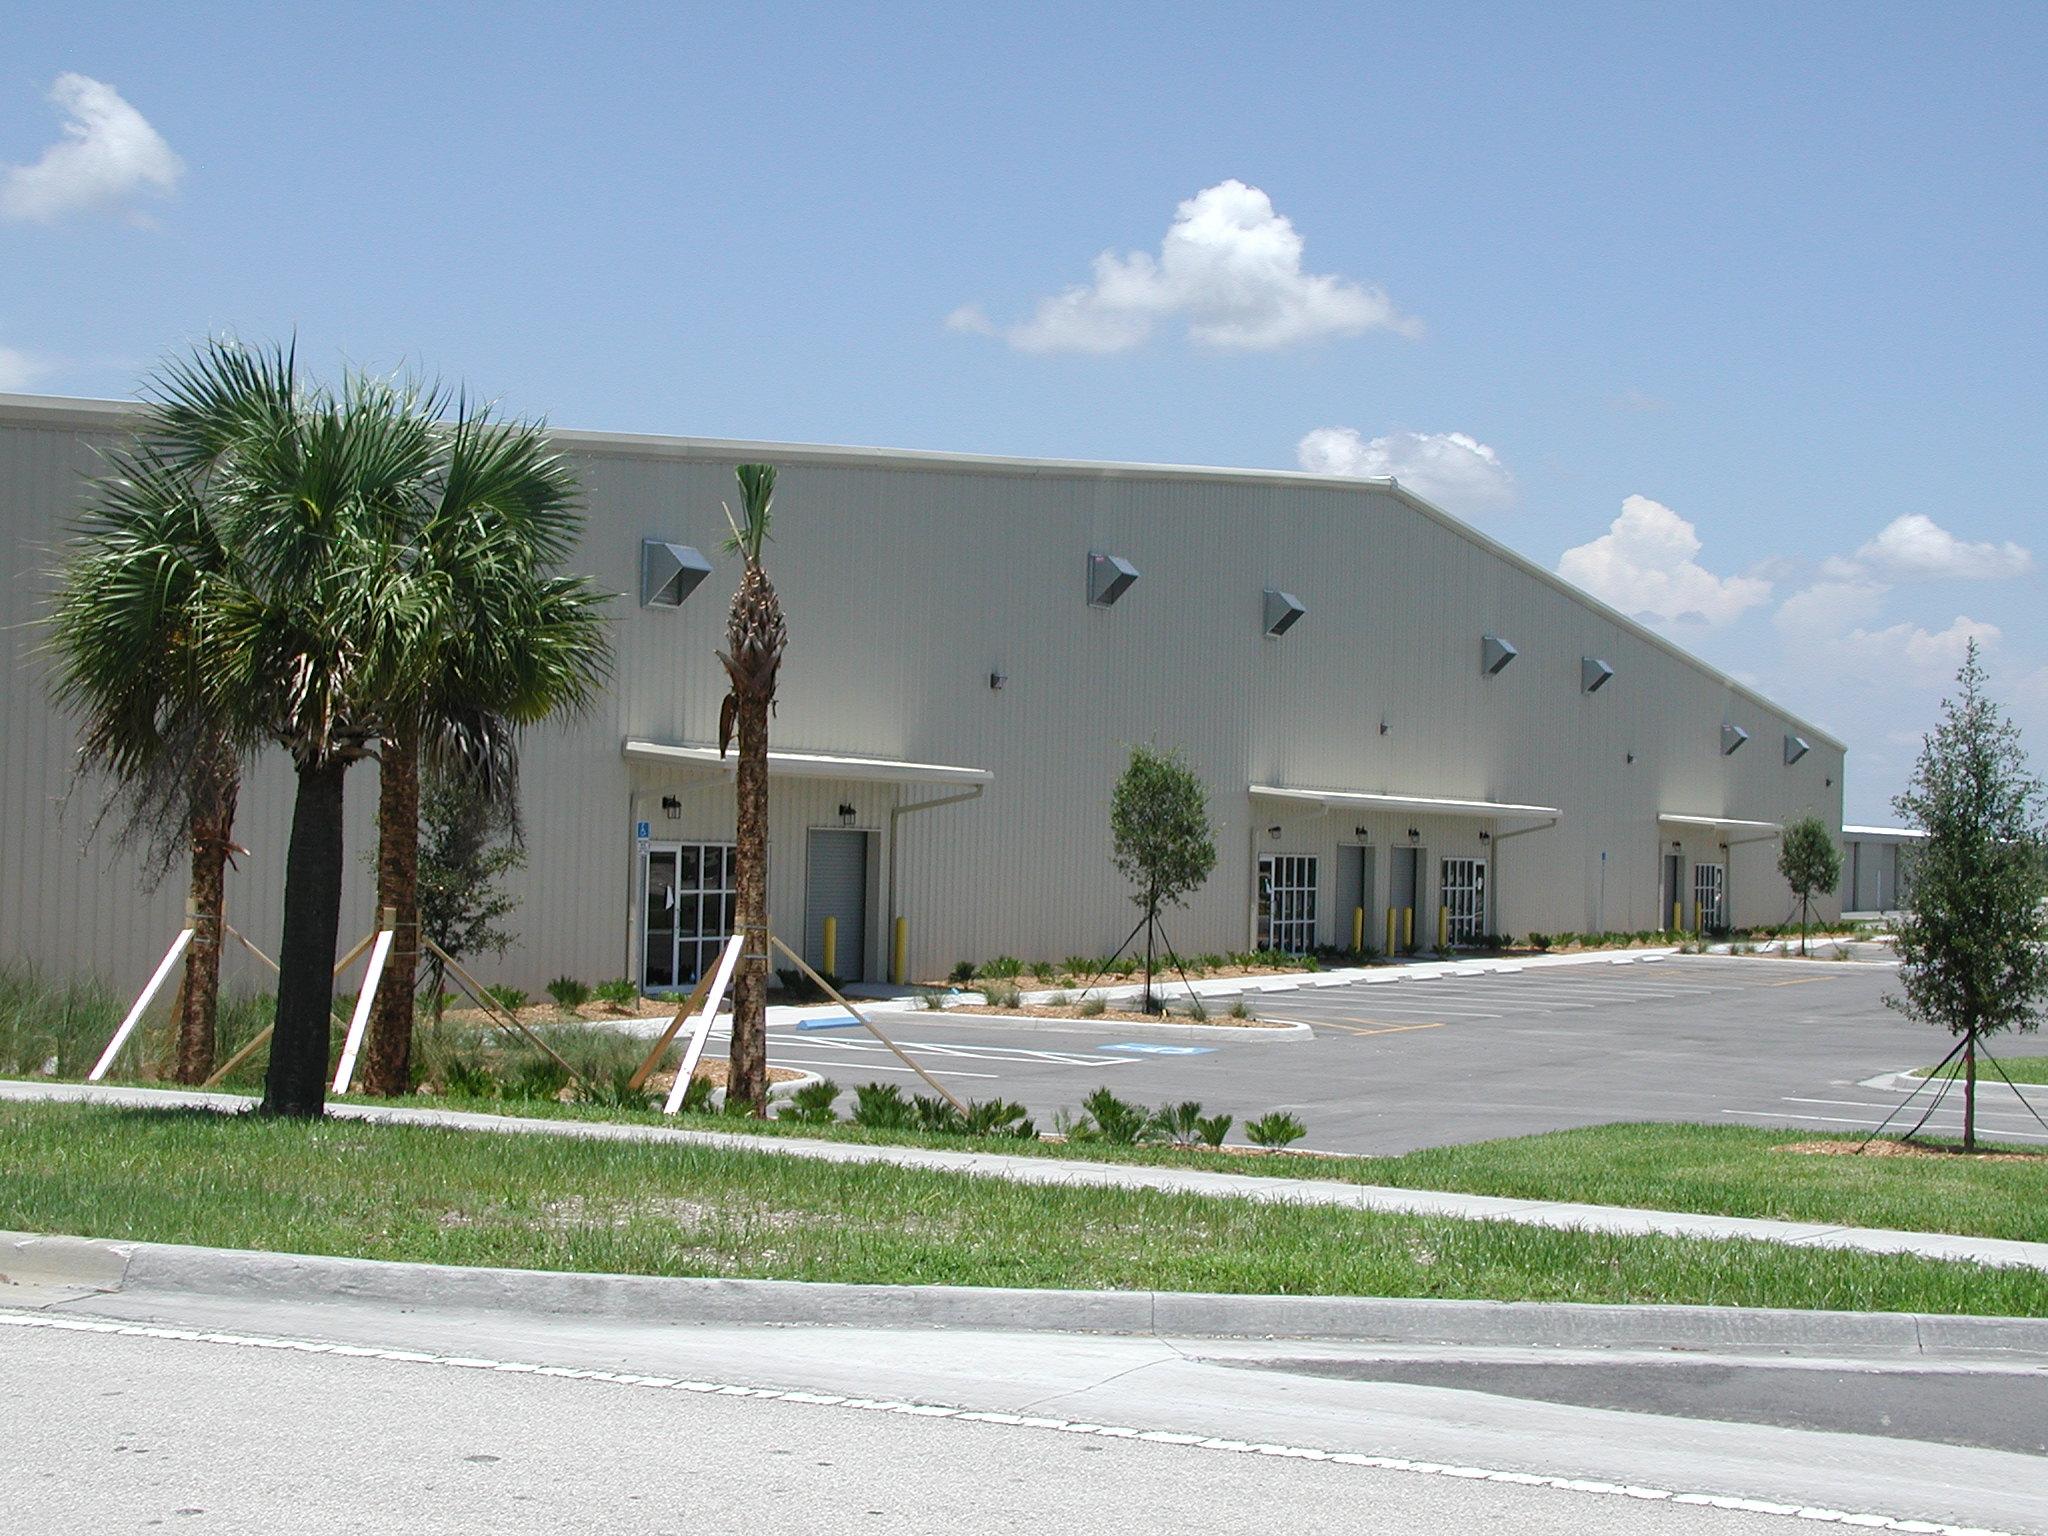 Sebring Airport Commercial Hangars